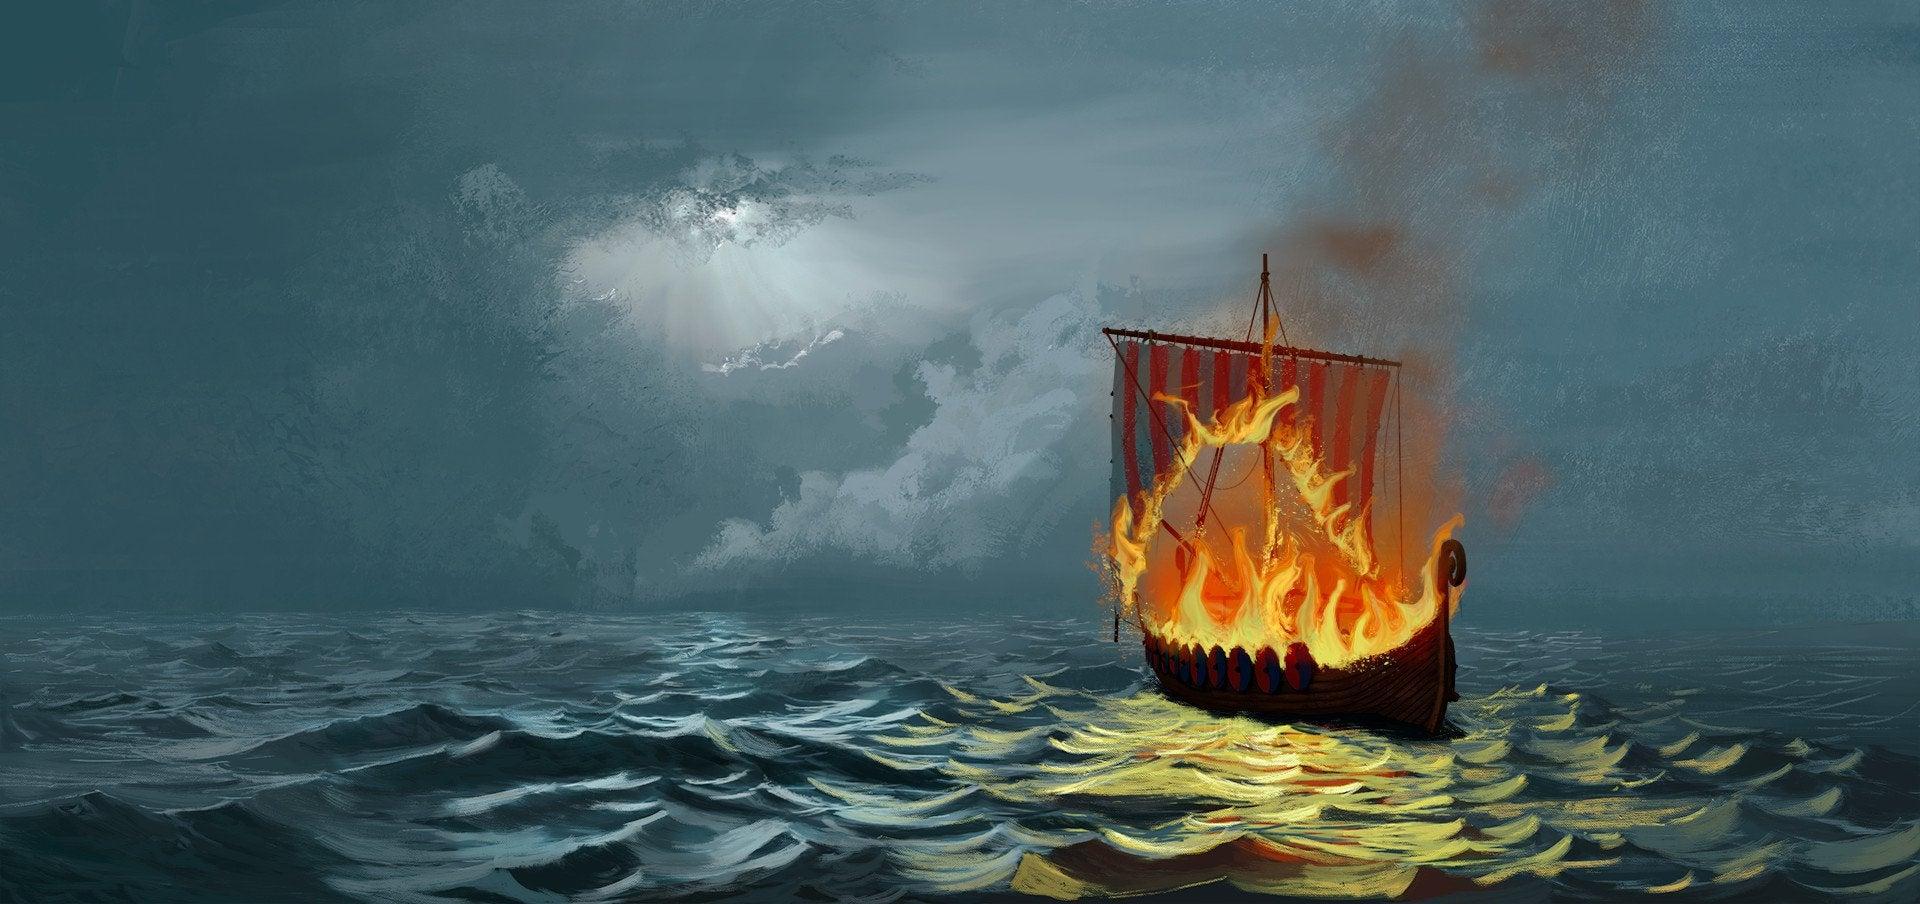 Похороны у викингов